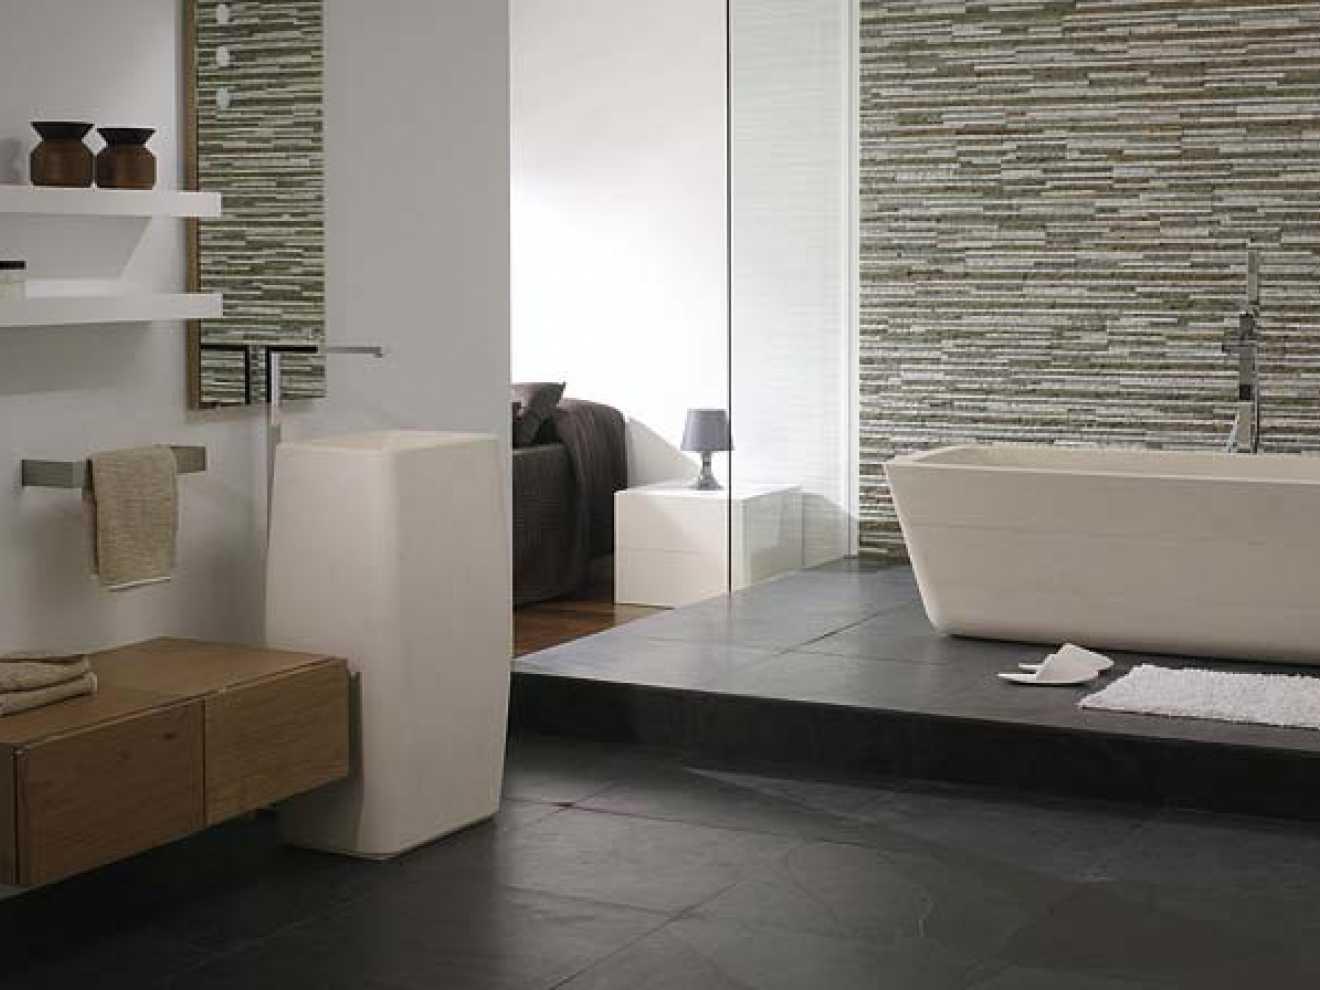 Bathroom Tiles Ireland mosaic bathroom tiles ireland : brightpulse